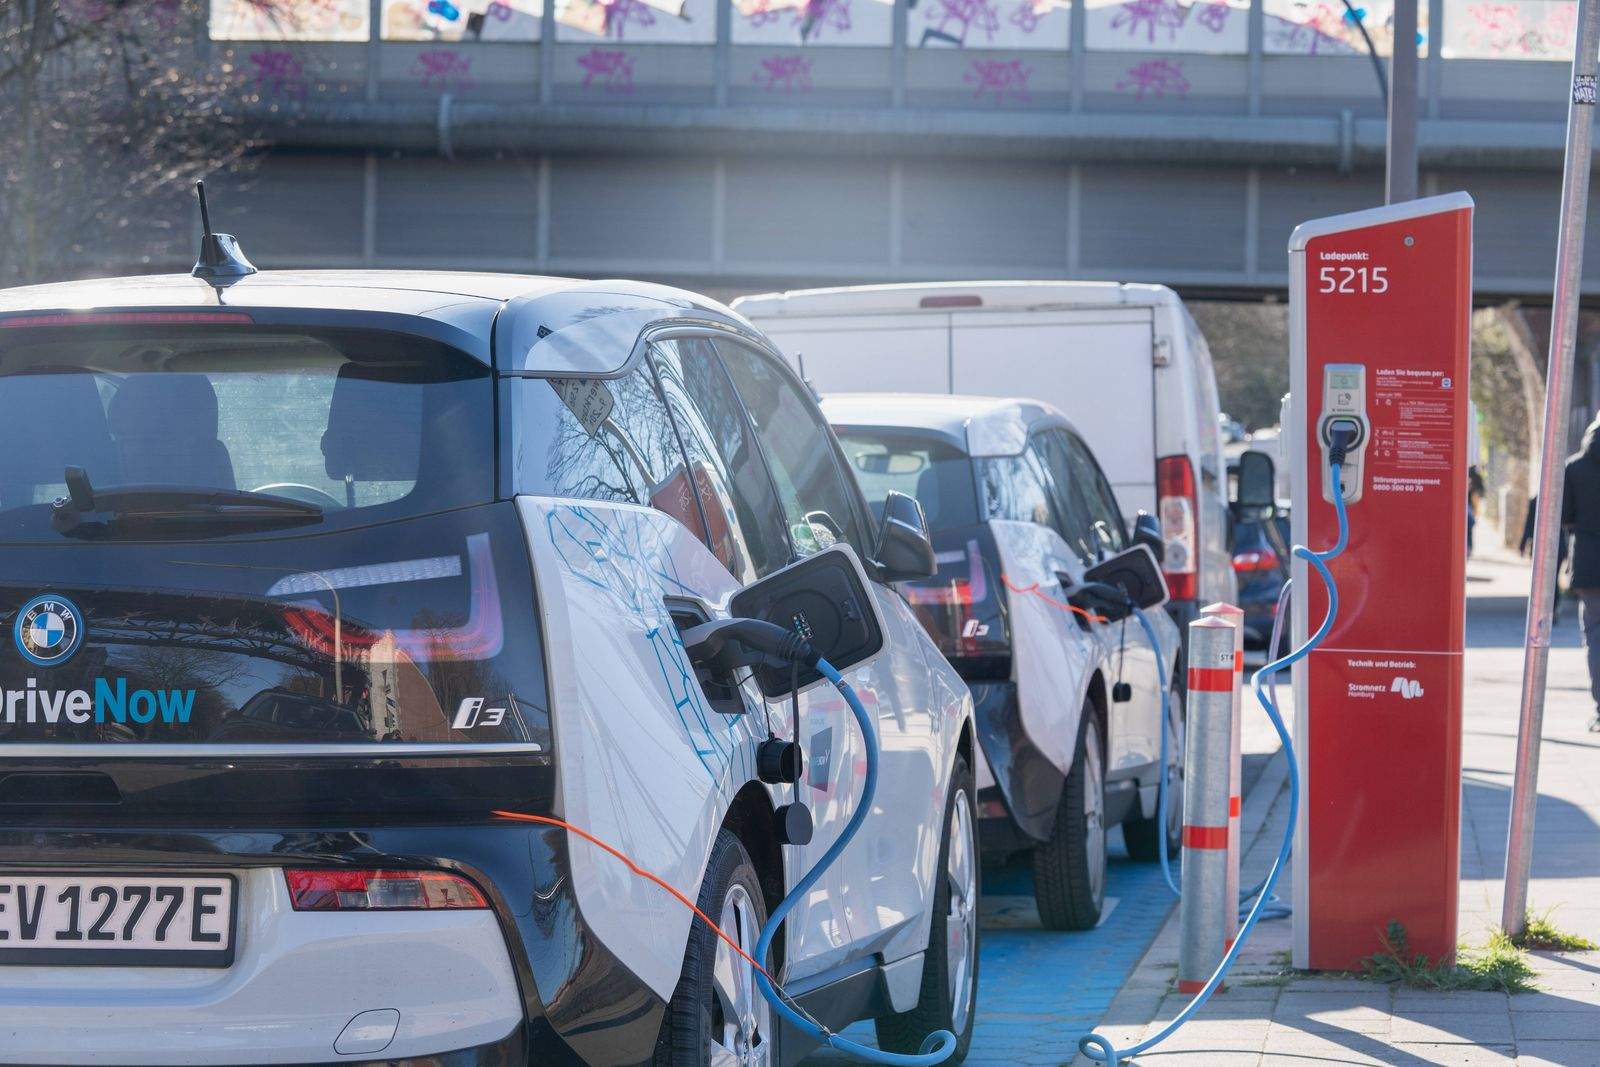 BMW i3 DriveNow DriveNow ShareNow . Ladestation CarSharing in Hamburg-Barmbek;BMW i3 DriveNow DriveNow ShareNow . Ladest